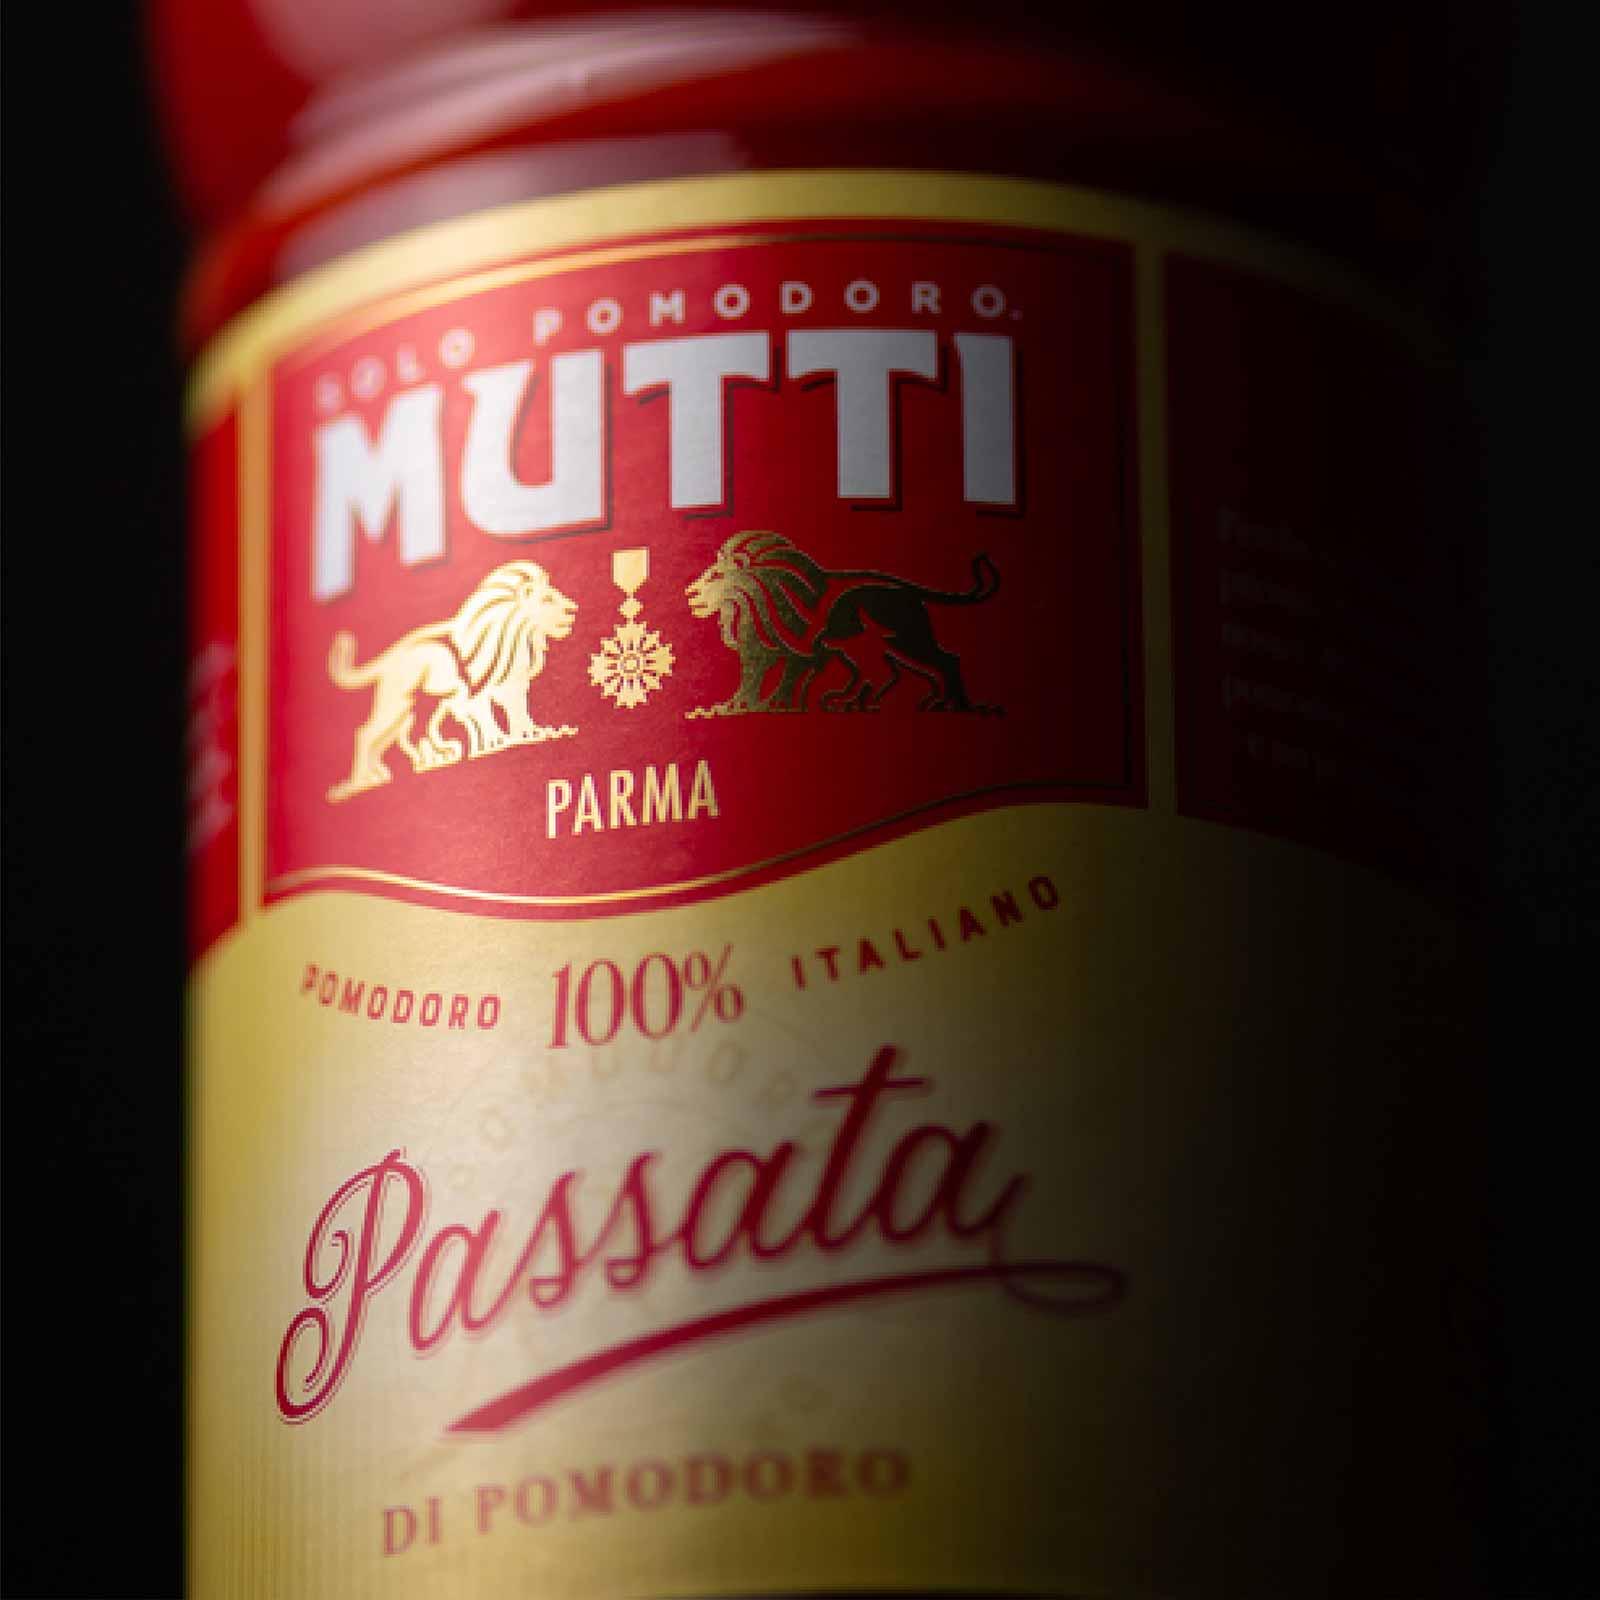 Dispenser - Packaging - Passata Mutti